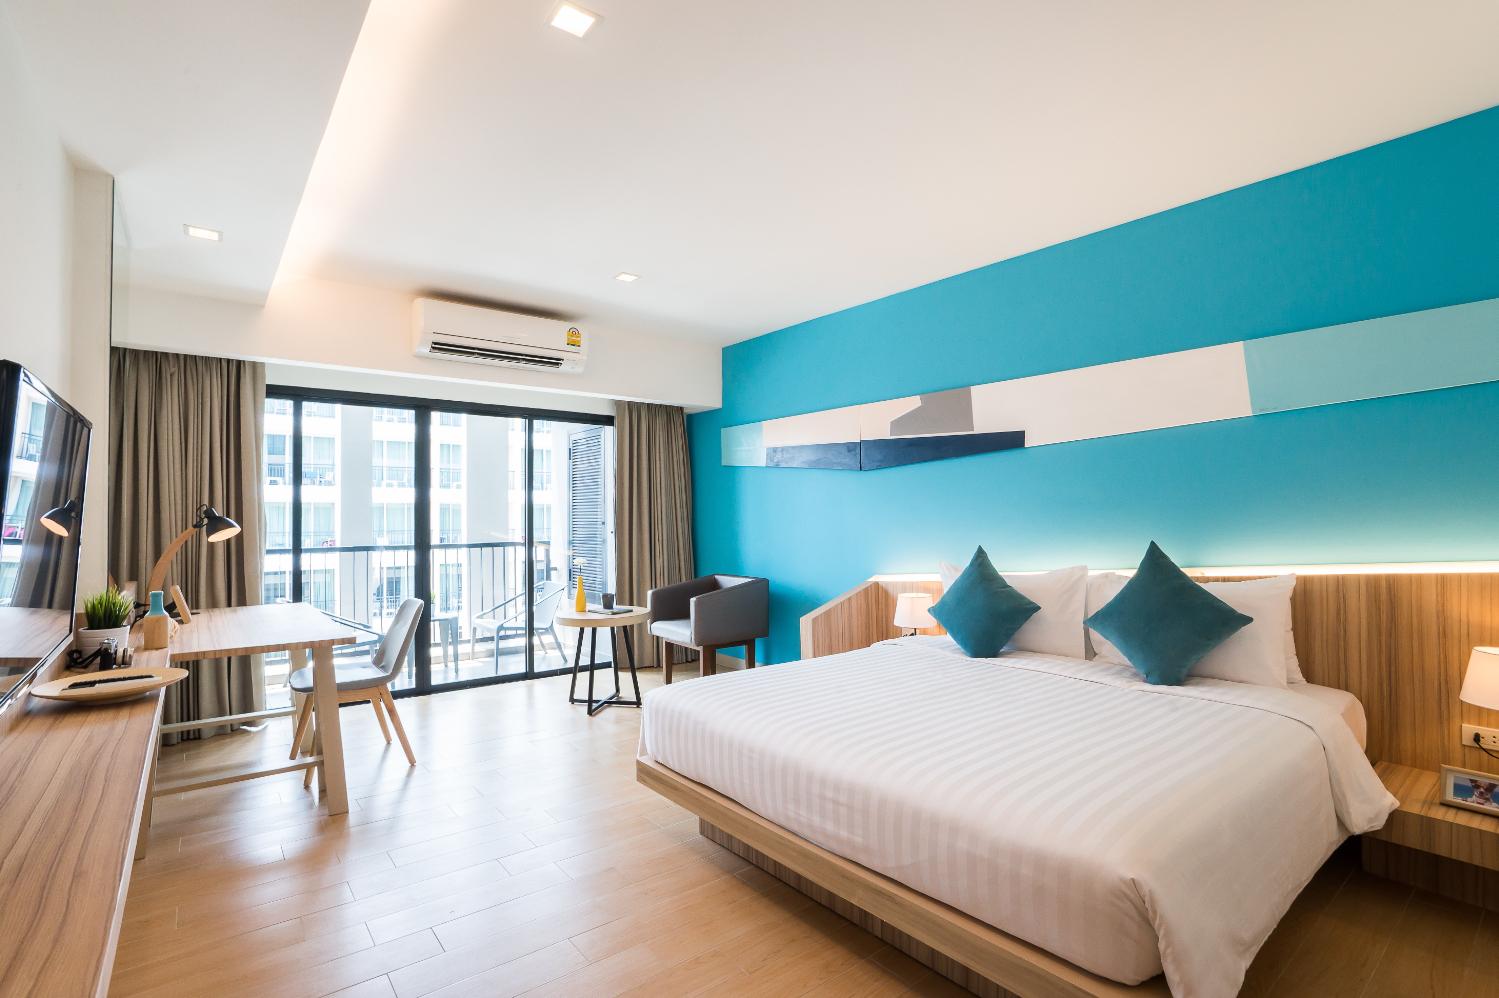 J Inspired Hotel Pattaya - Image 2